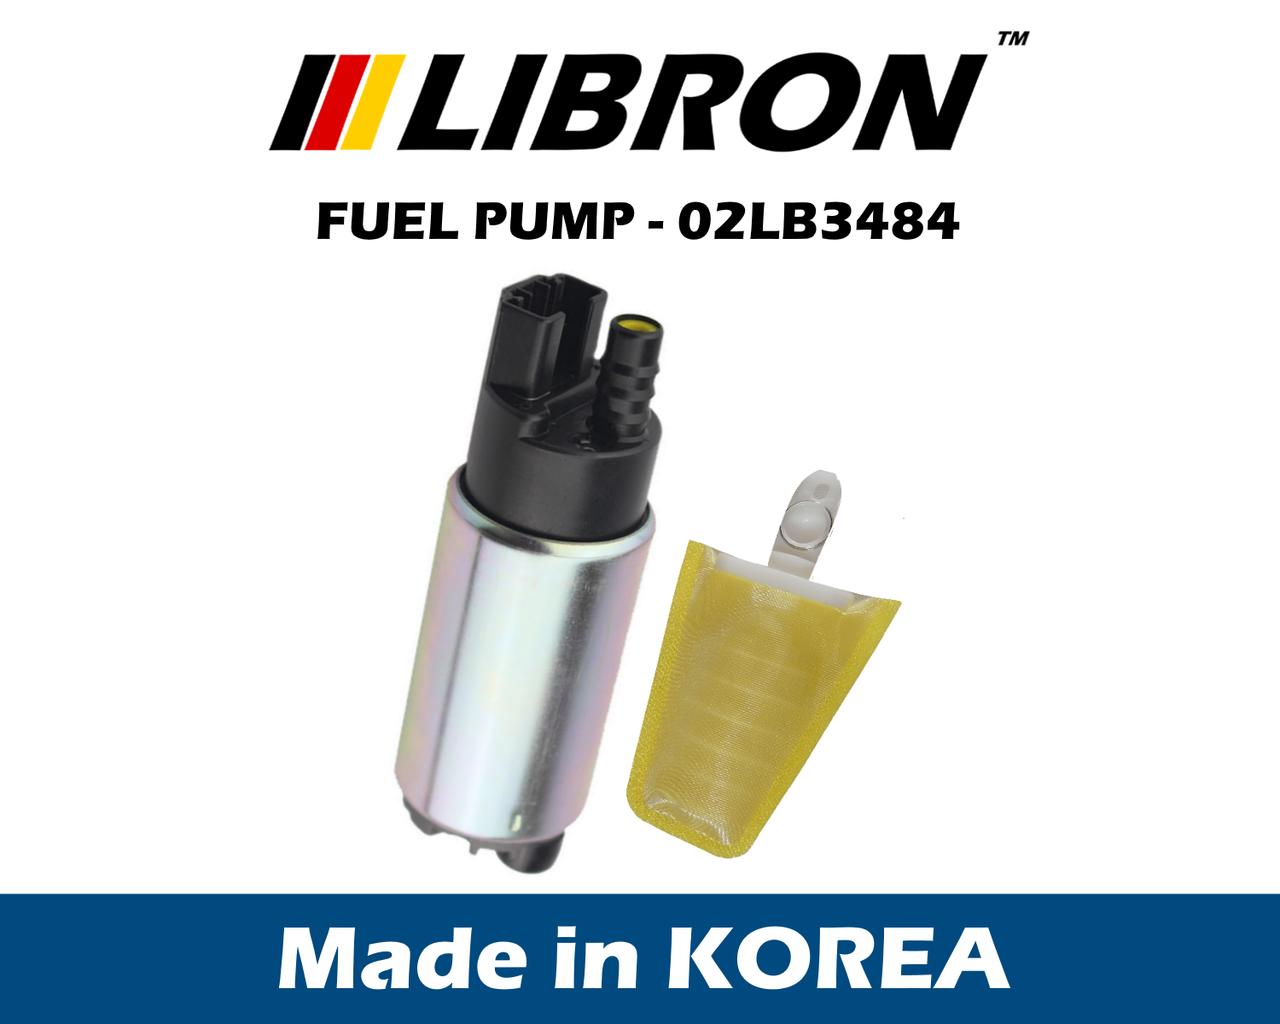 Бензонасос LIBRON 02LB3484 - Хонда Интегра купе